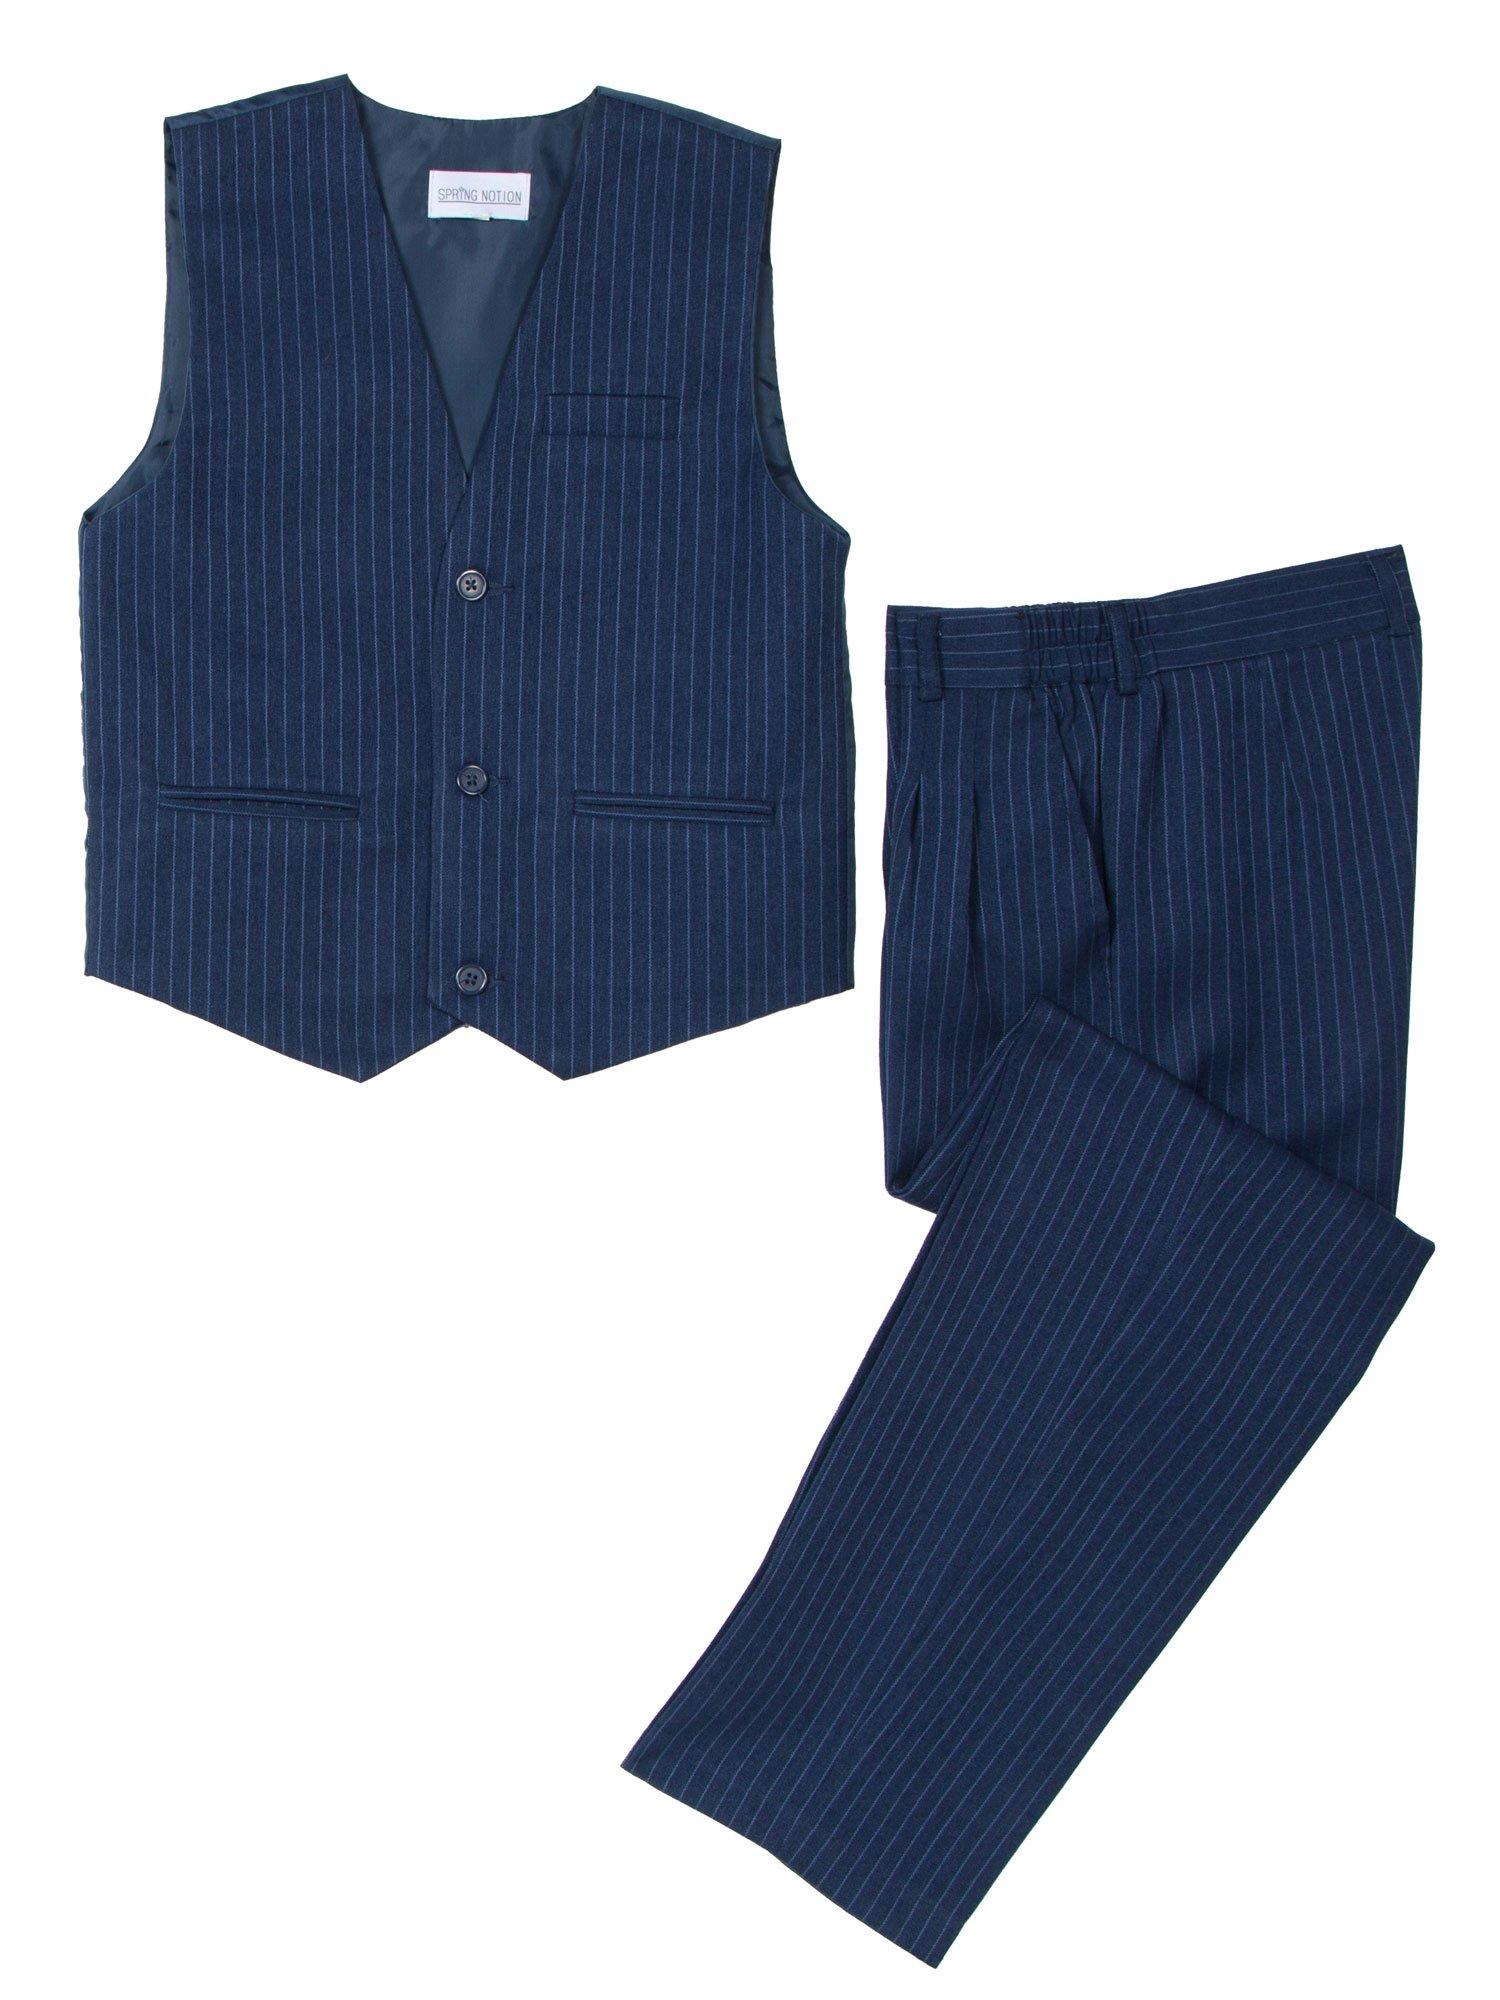 Spring Notion Big Boys' 2 Piece Pinstripe Vest Set 2T Blue